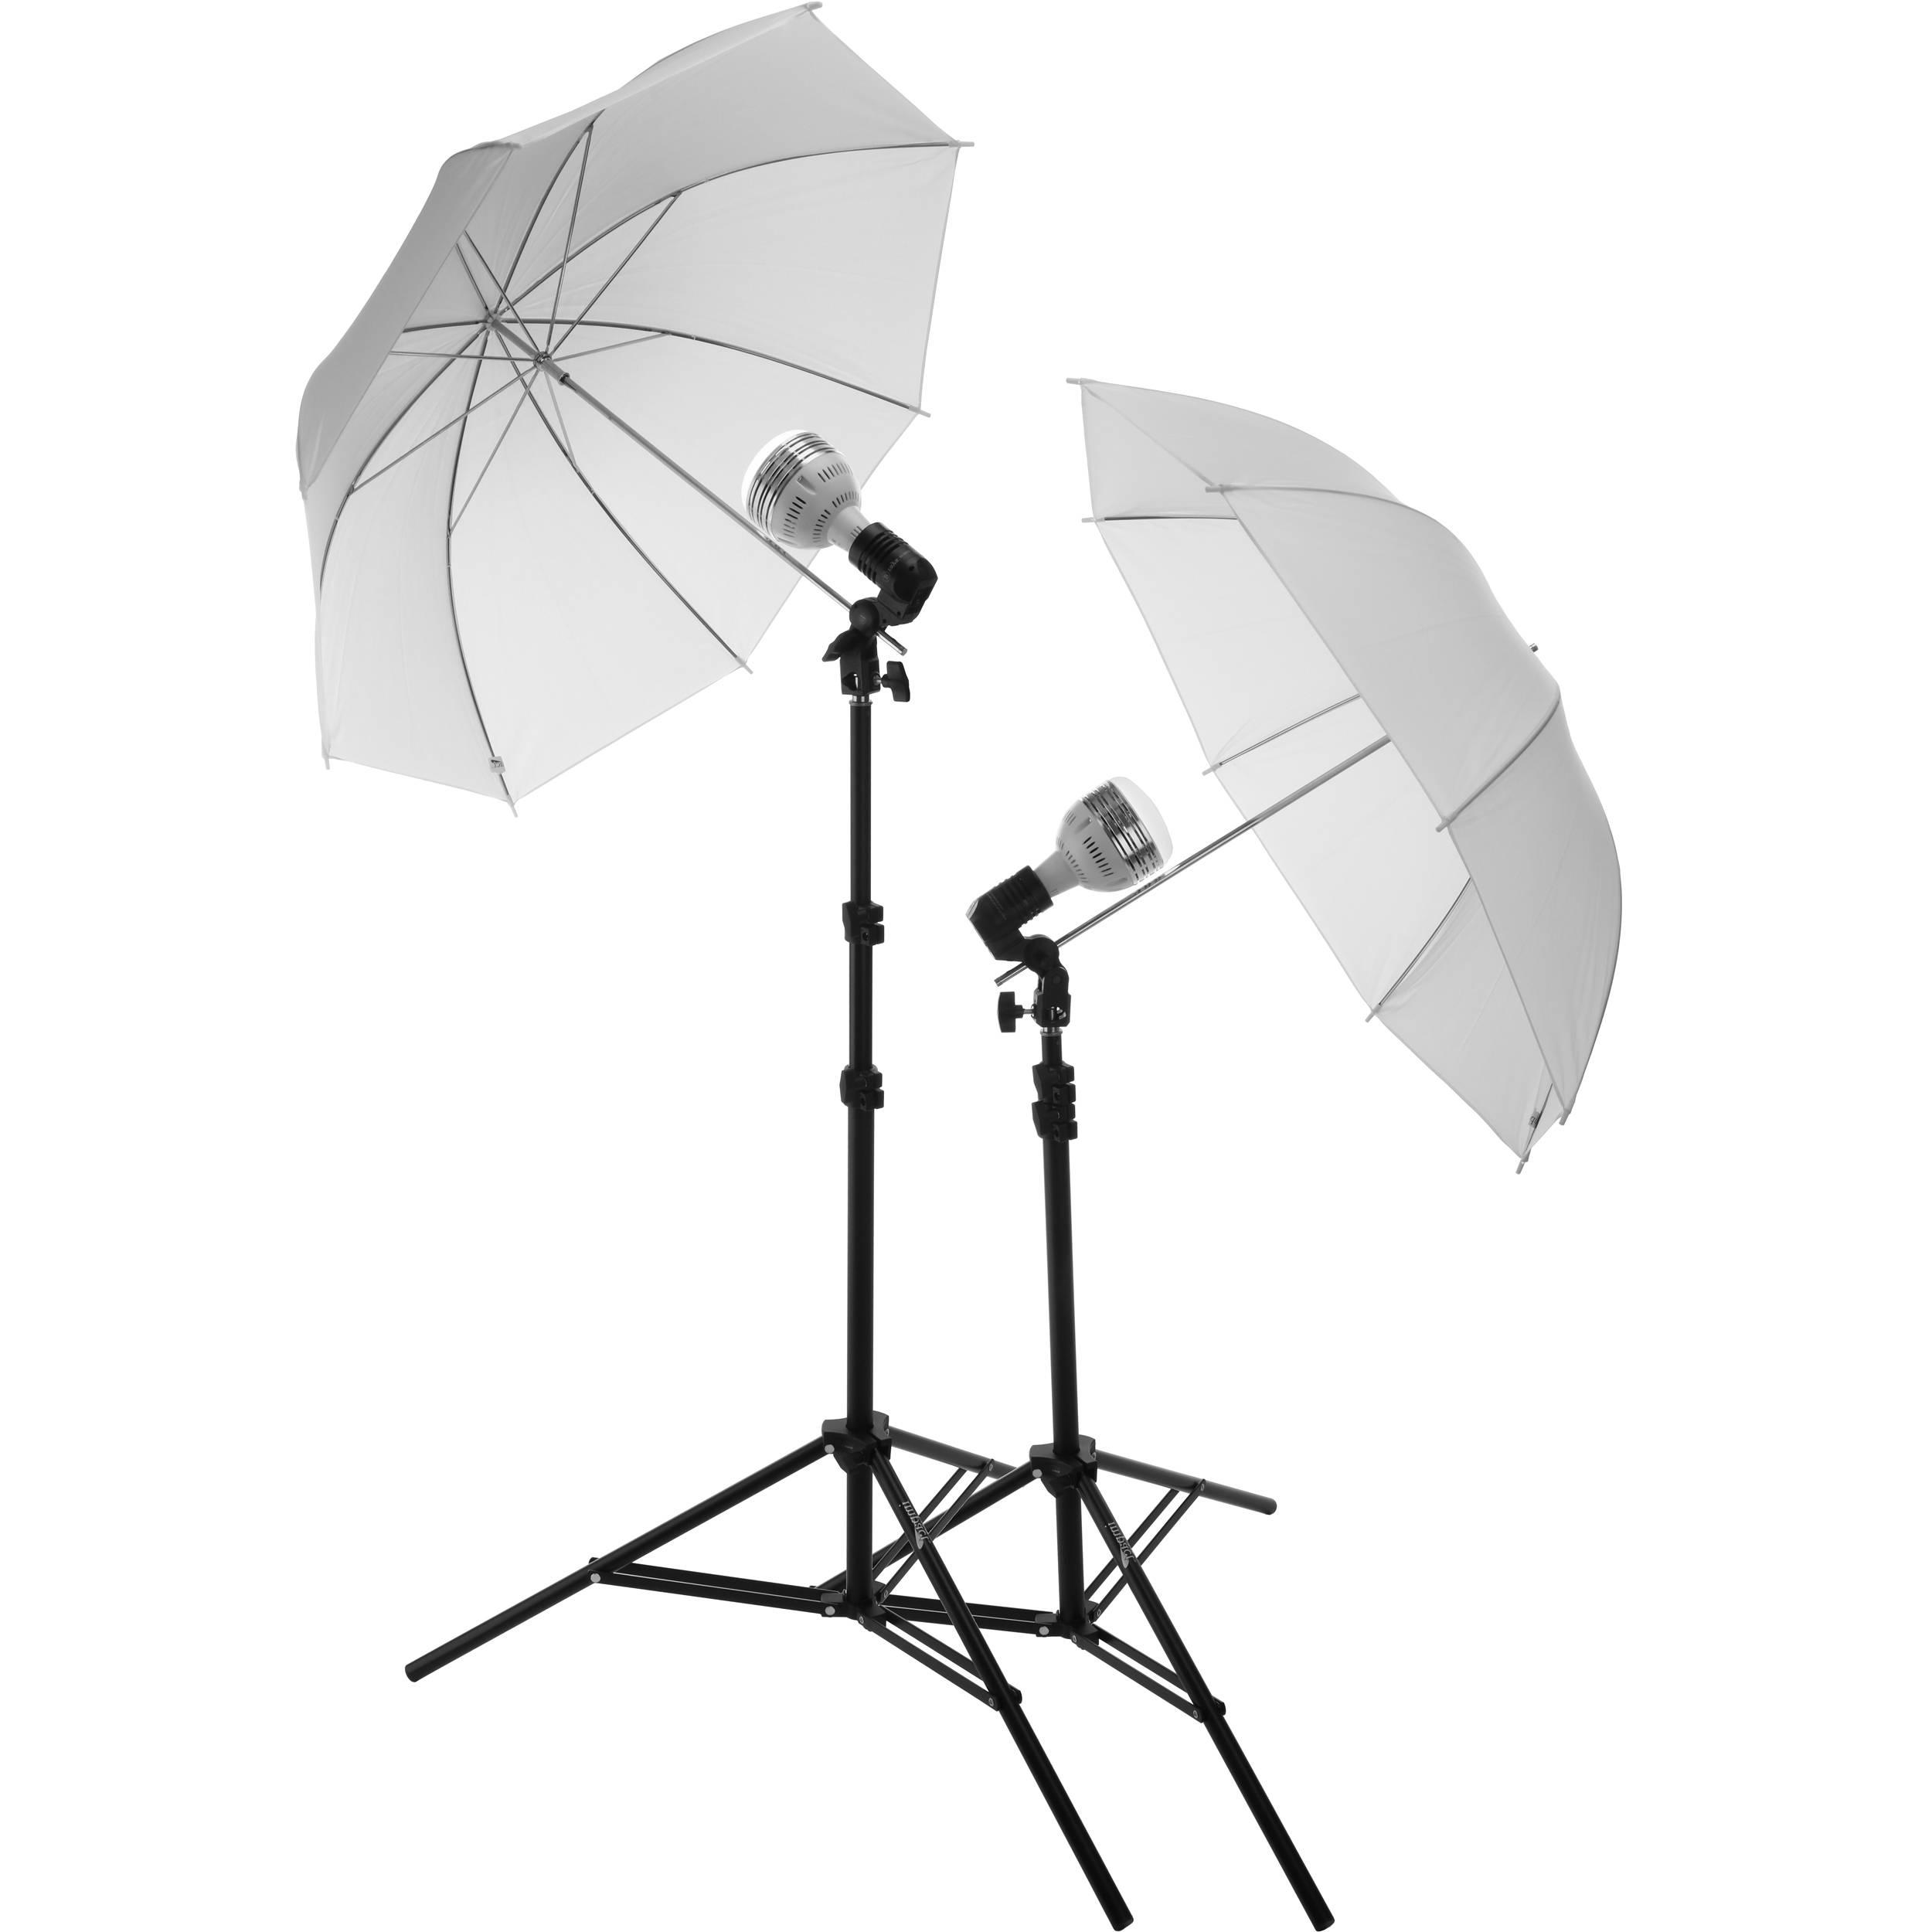 2500x2500 Impact Portrait Light Kit With 6' Light Stand, Ledfluorescent